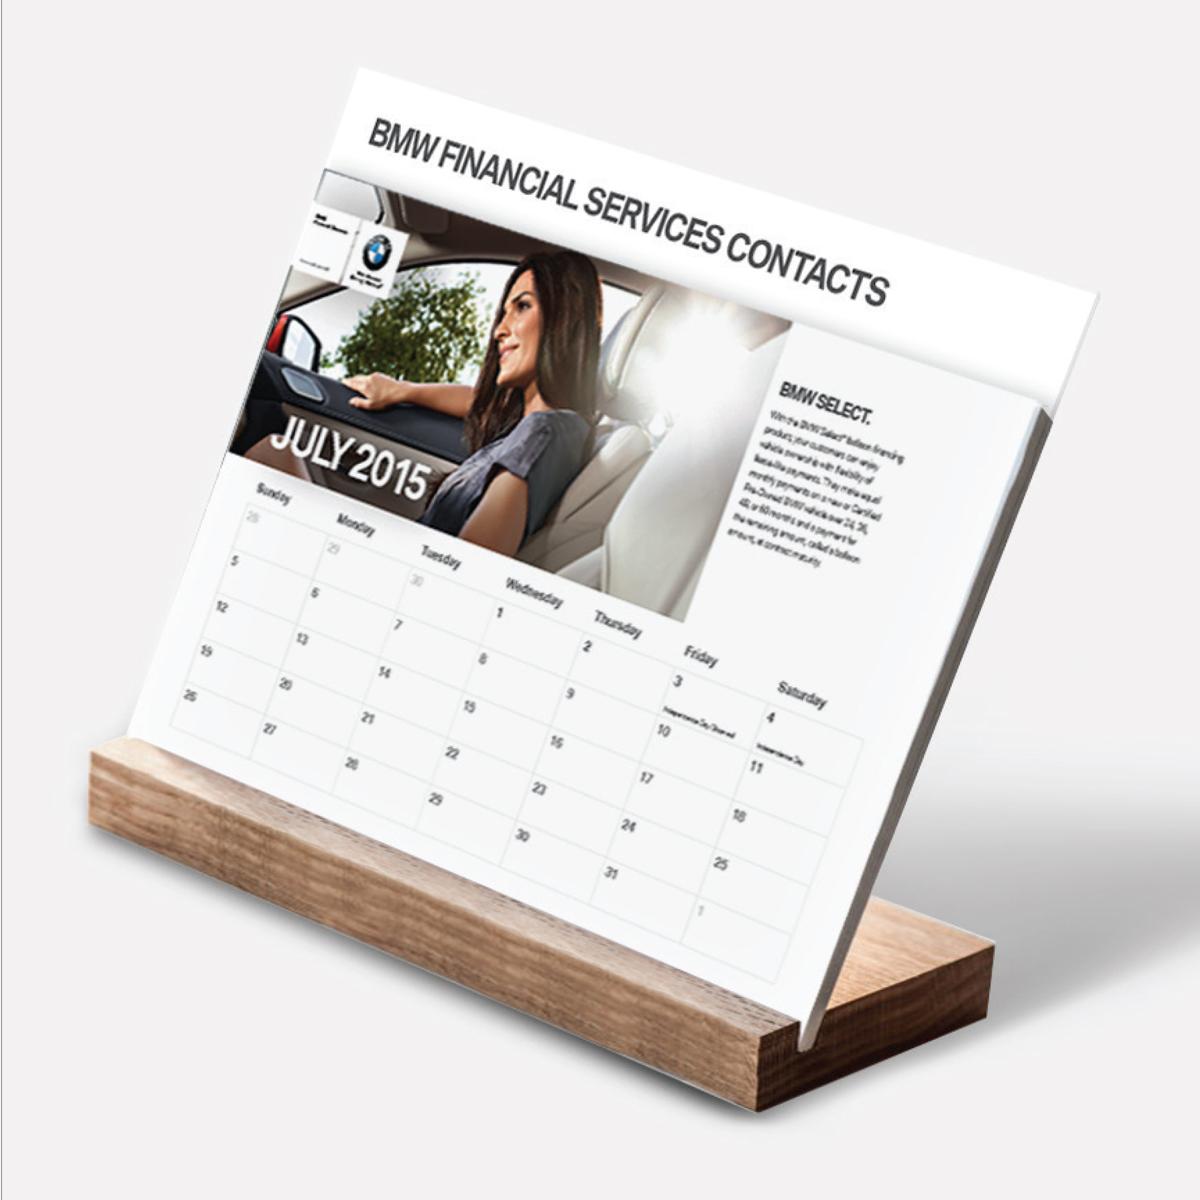 bmw-calendar-woodblock.jpg